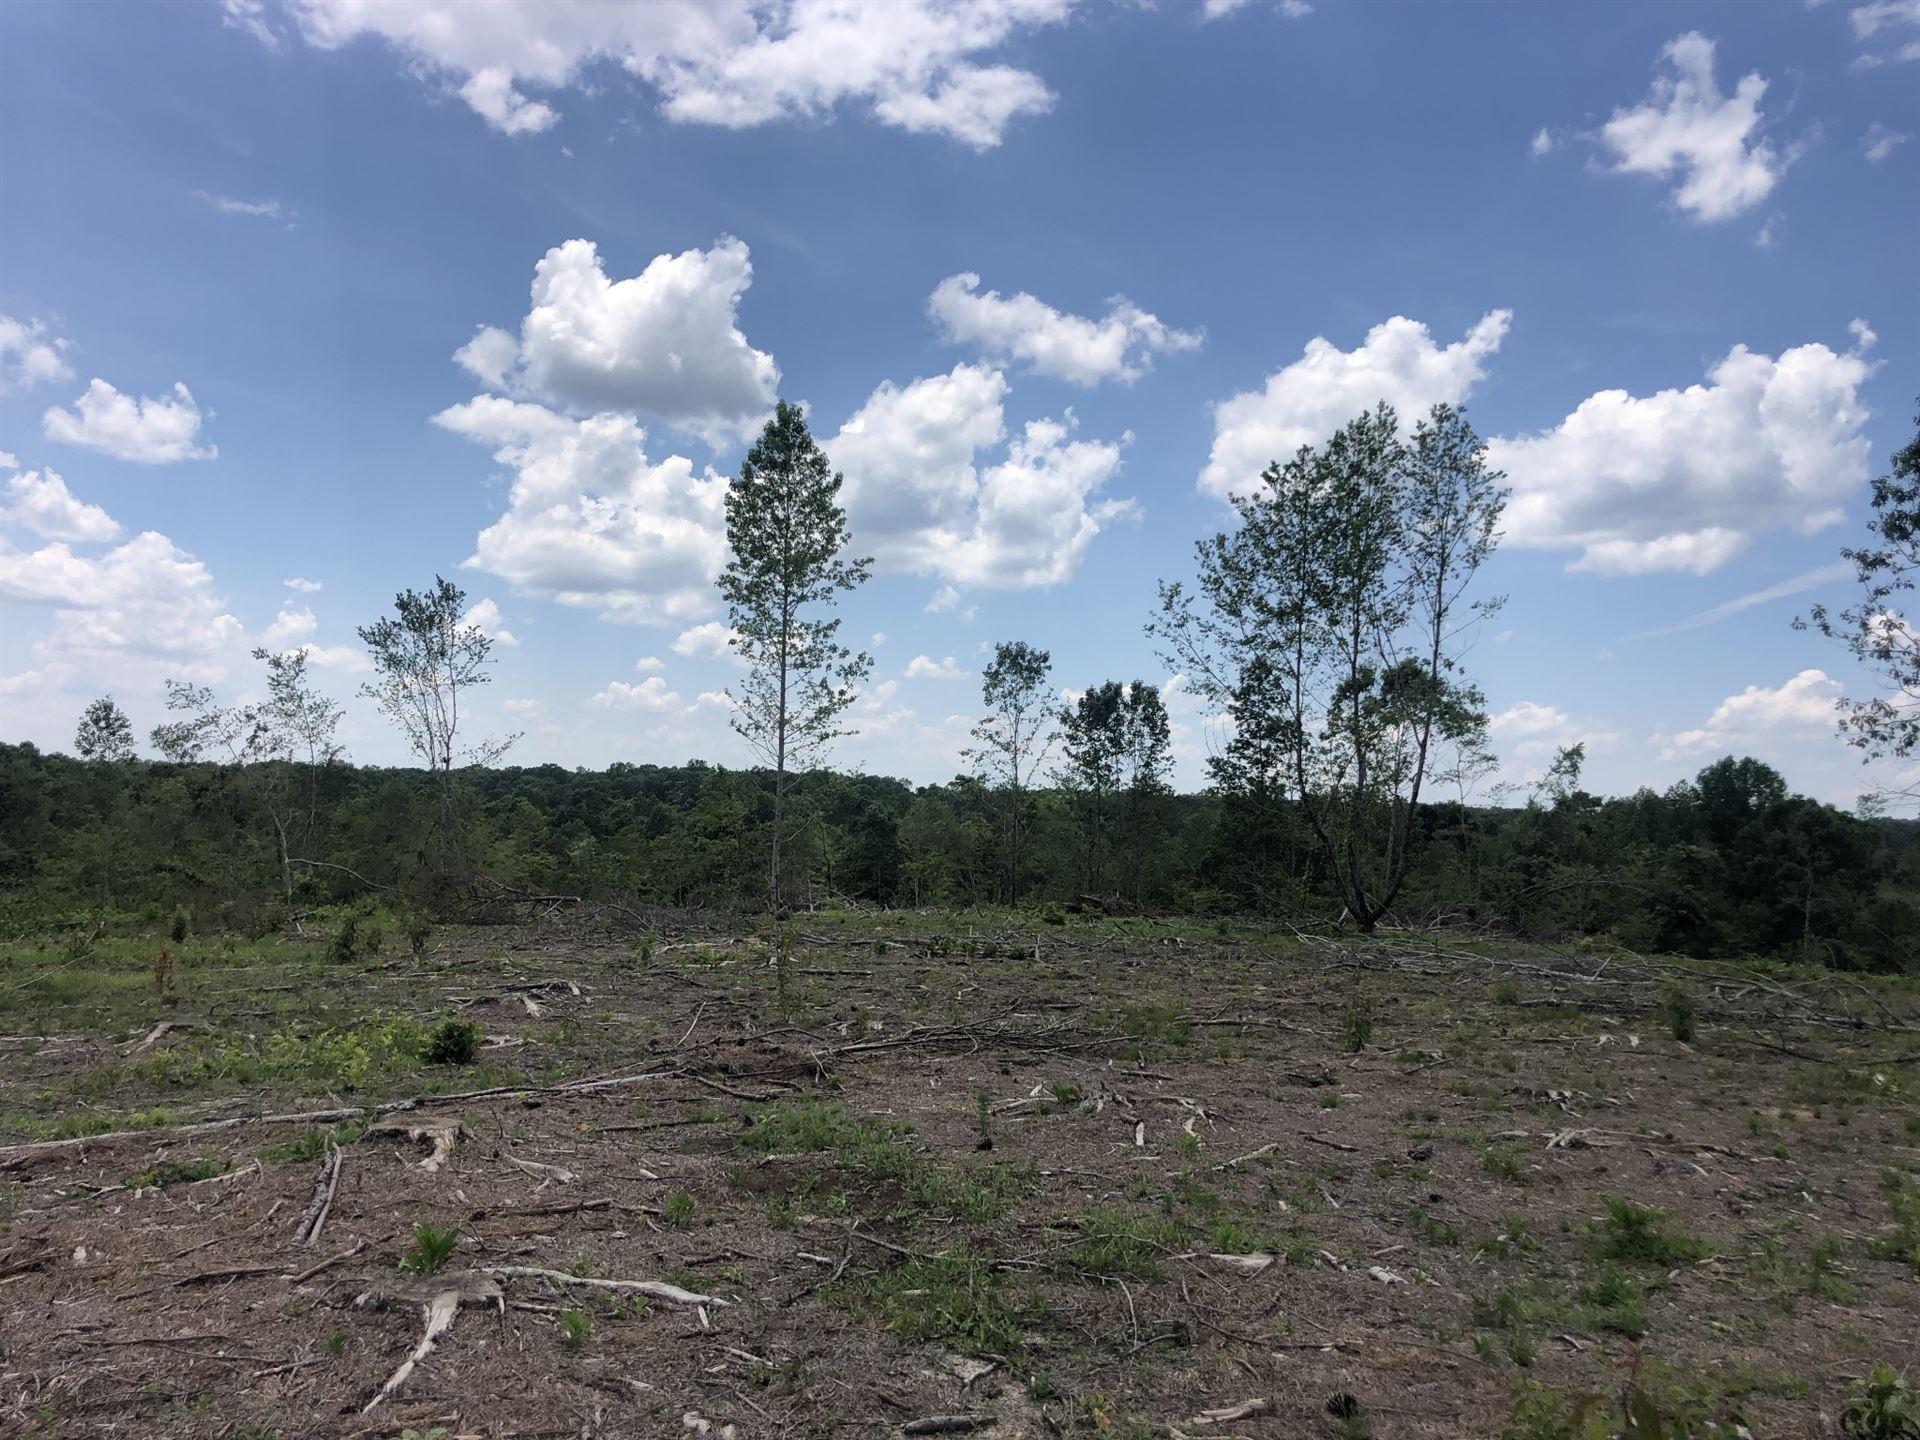 Photo of 0 Buck Branch Rd, Lawrenceburg, TN 38464 (MLS # 2162482)